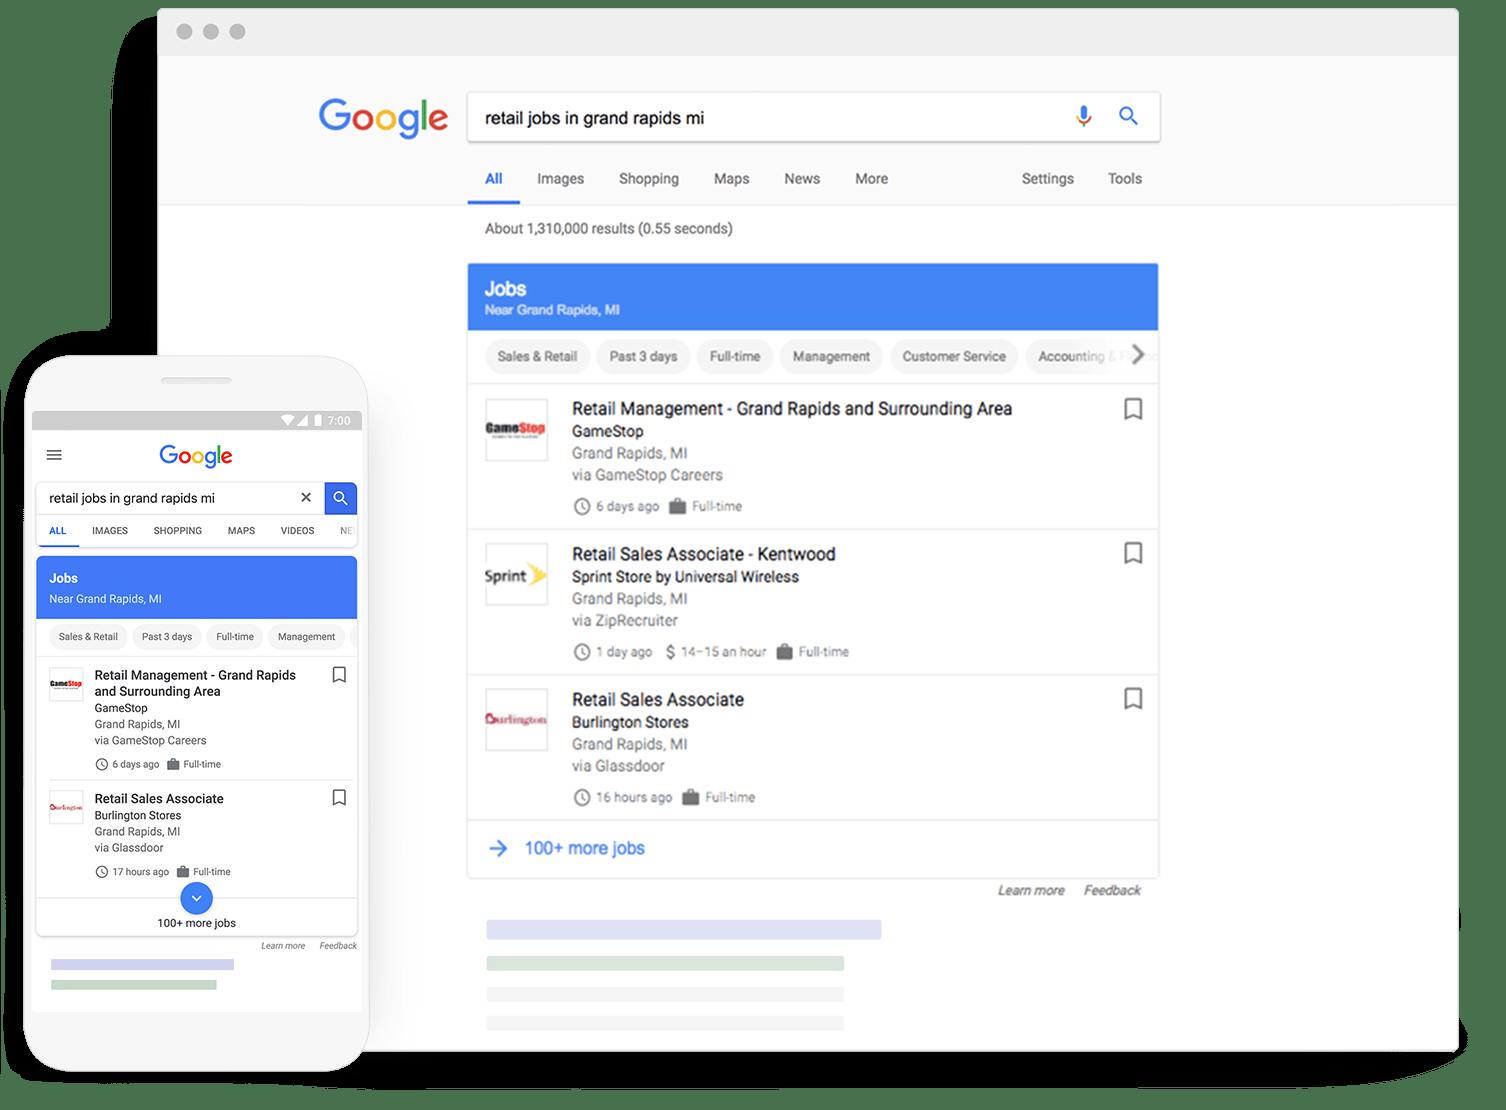 job posting in google - نحوه نمایش آگهی های شغلی در نتایج جستجو گوگل